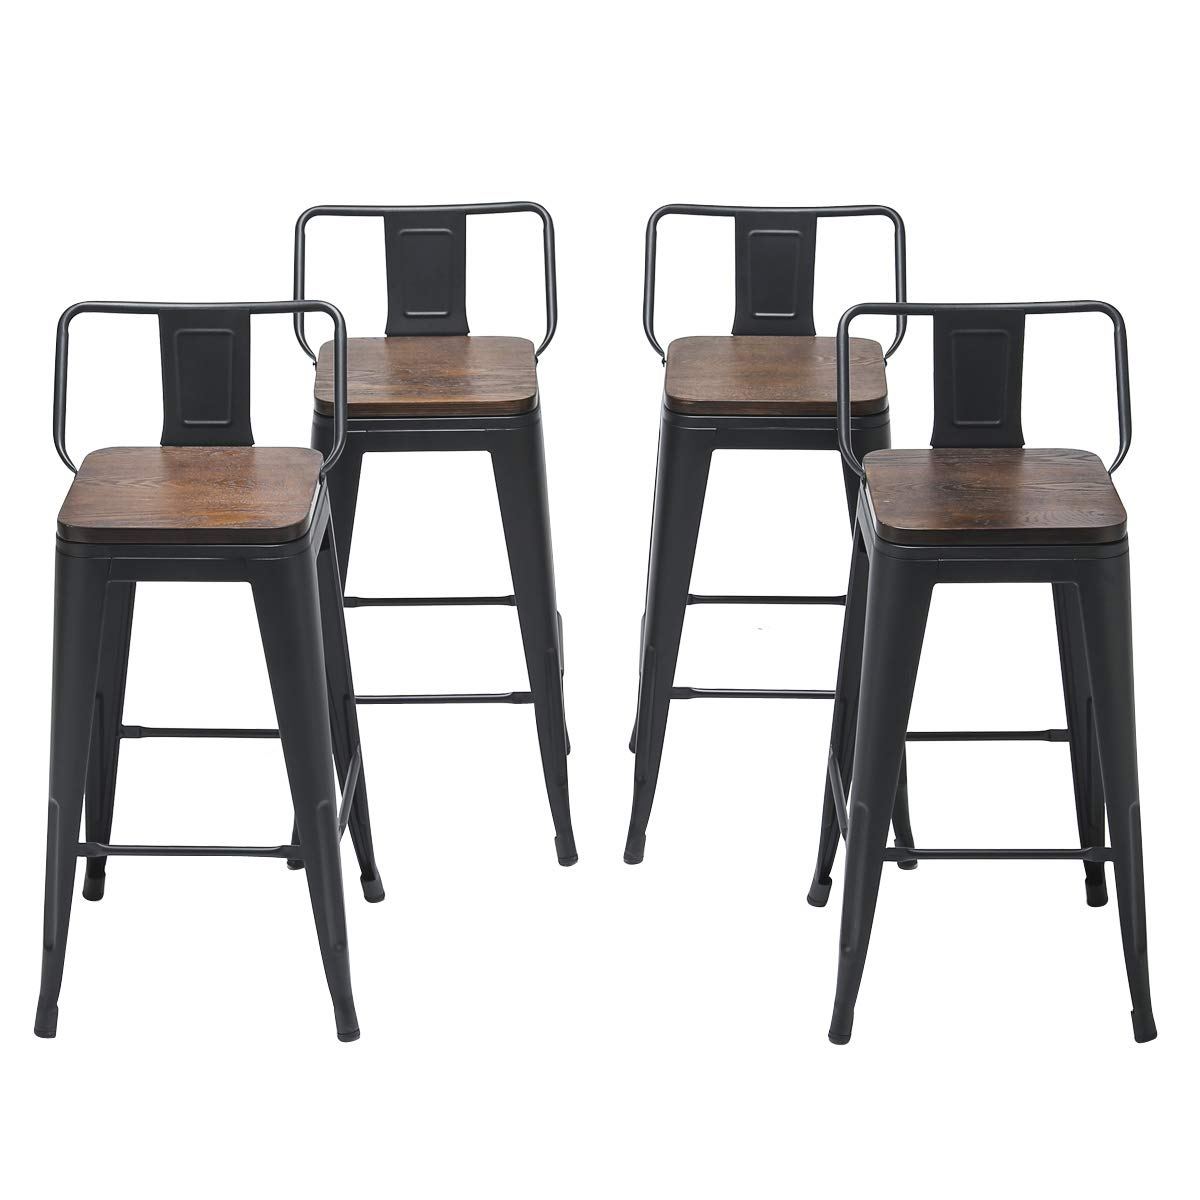 Changjie Furniture 24 Inch Swivel Metal Bar Stool Kitchen Counter Bar Stools Set of 4 24 inch, Swivel Low Back Black Wooden